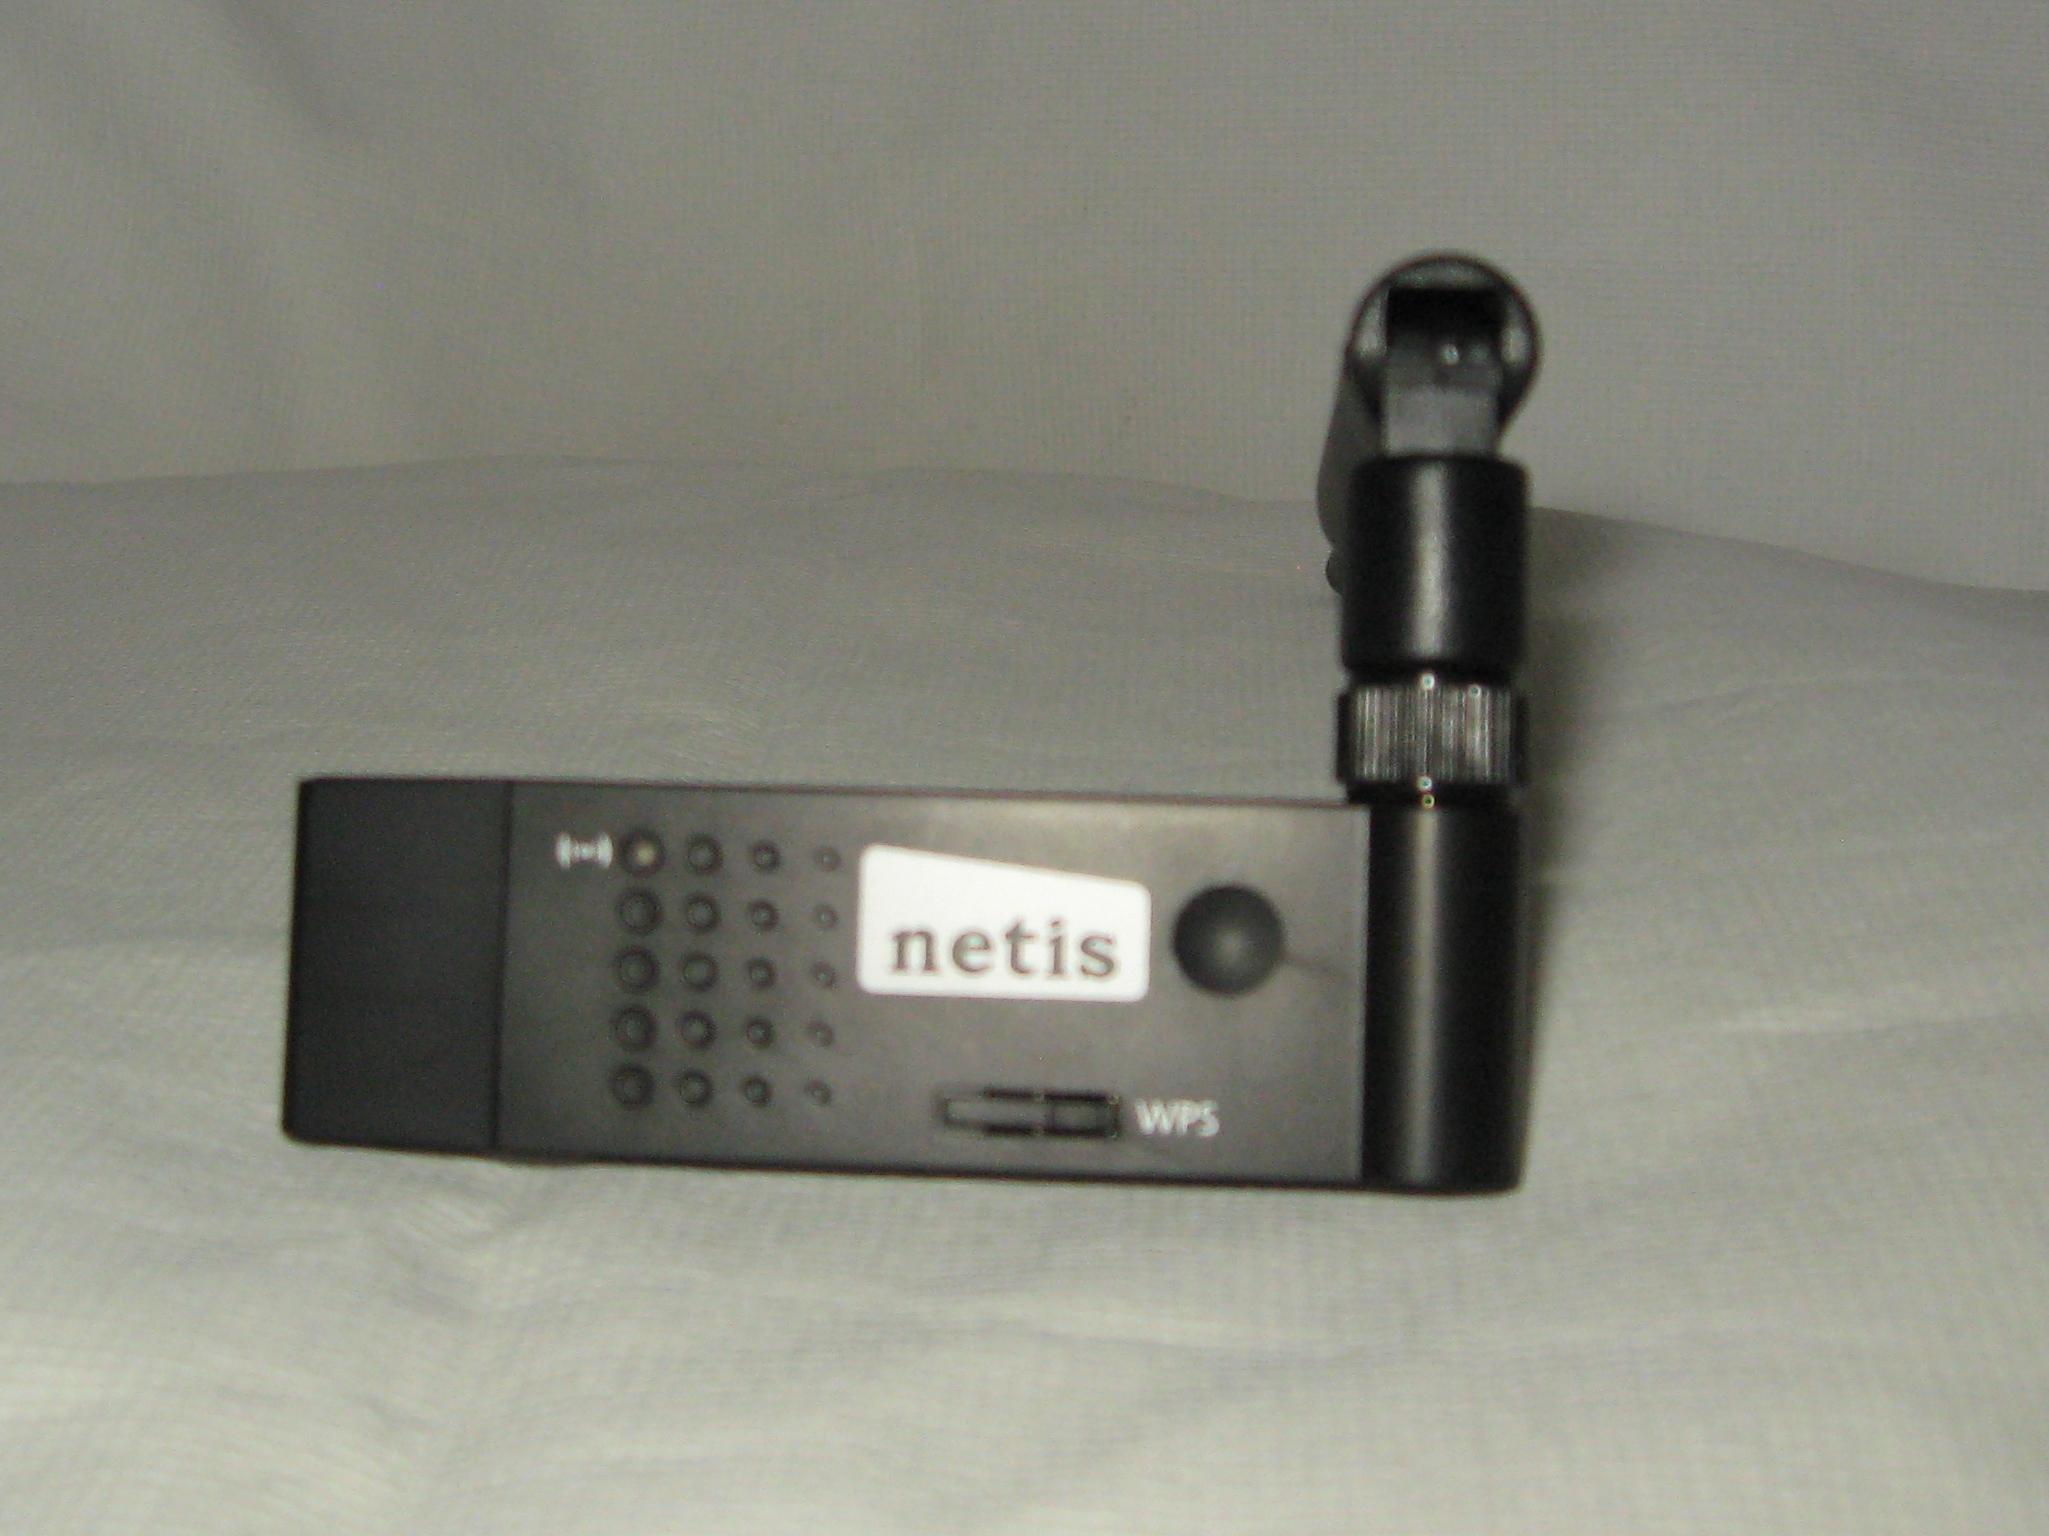 netis wireless usb adapter